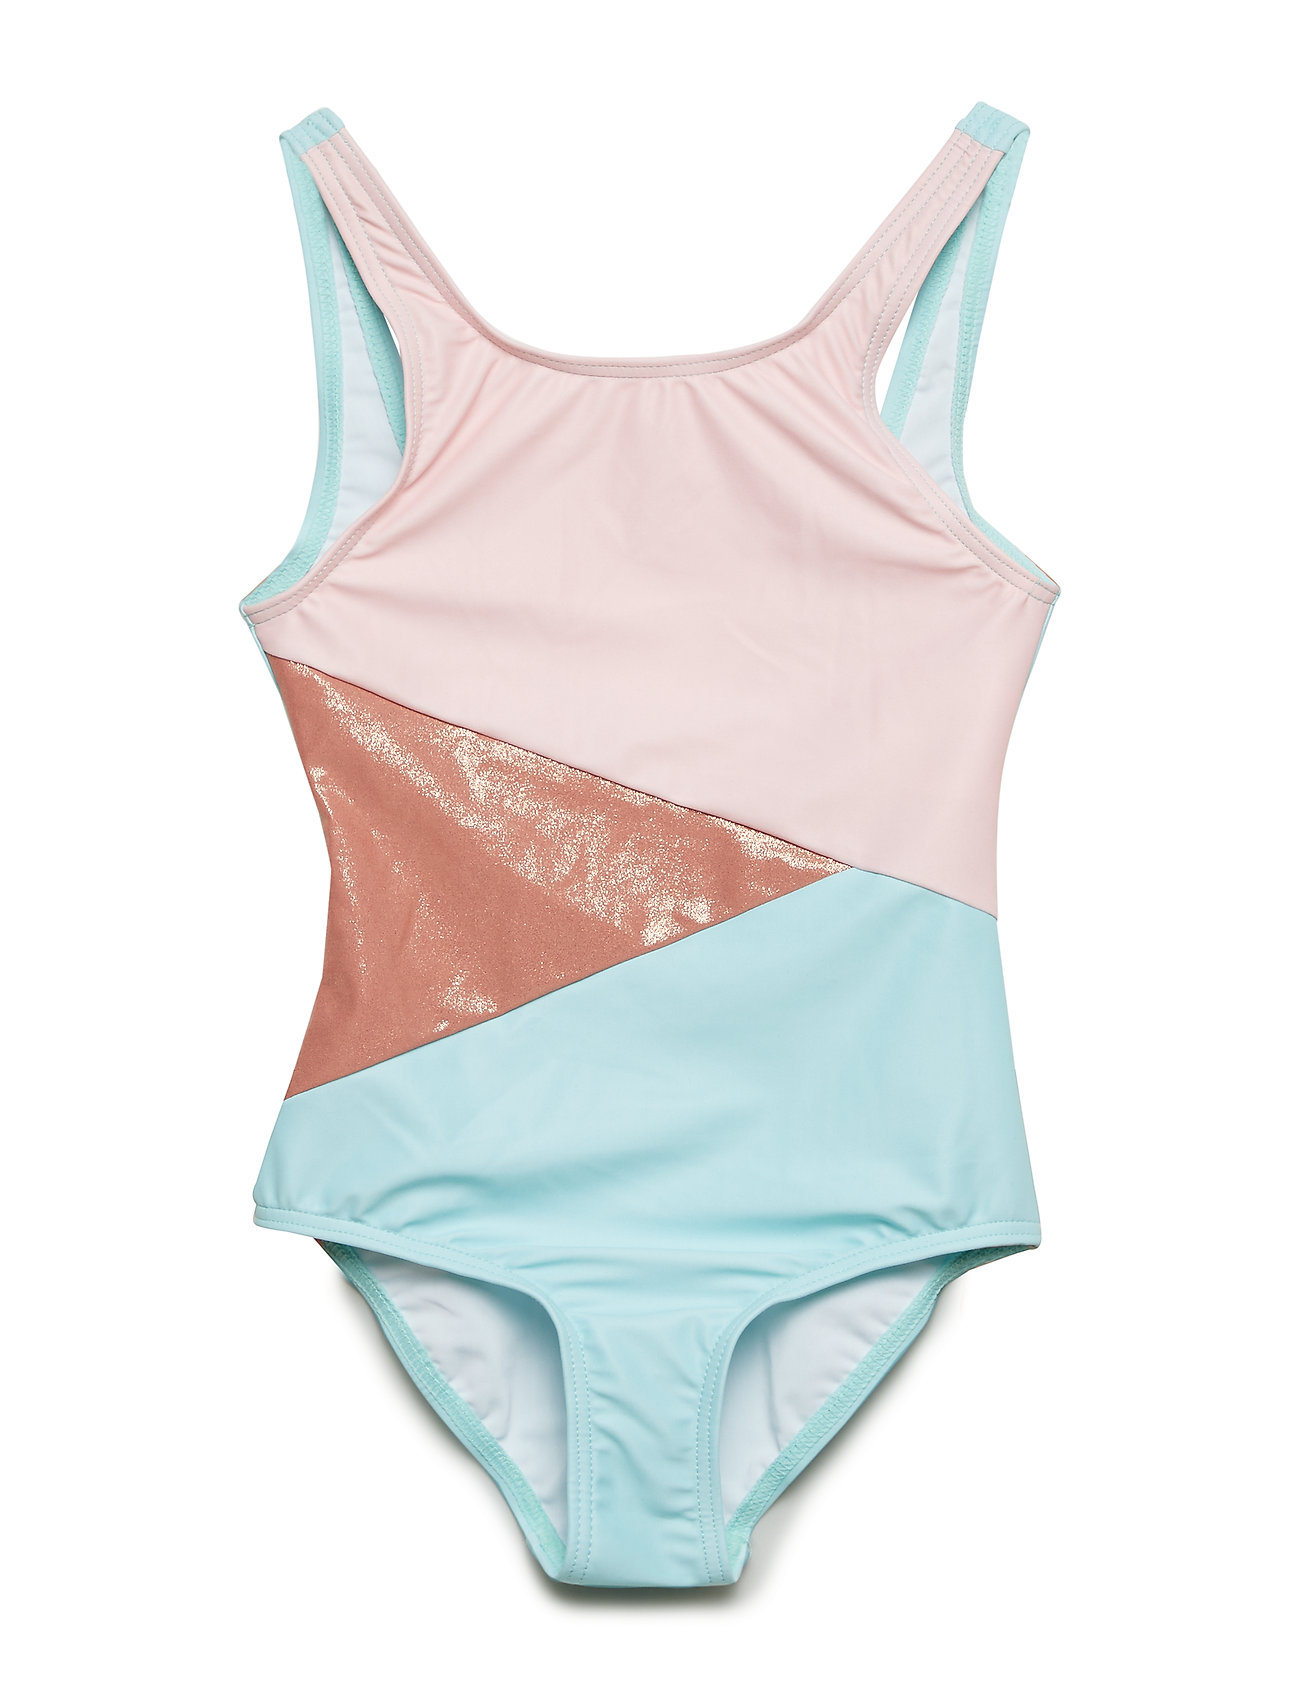 Soft Gallery Darlin Swimsuit - BLOCK SWIM GIRL